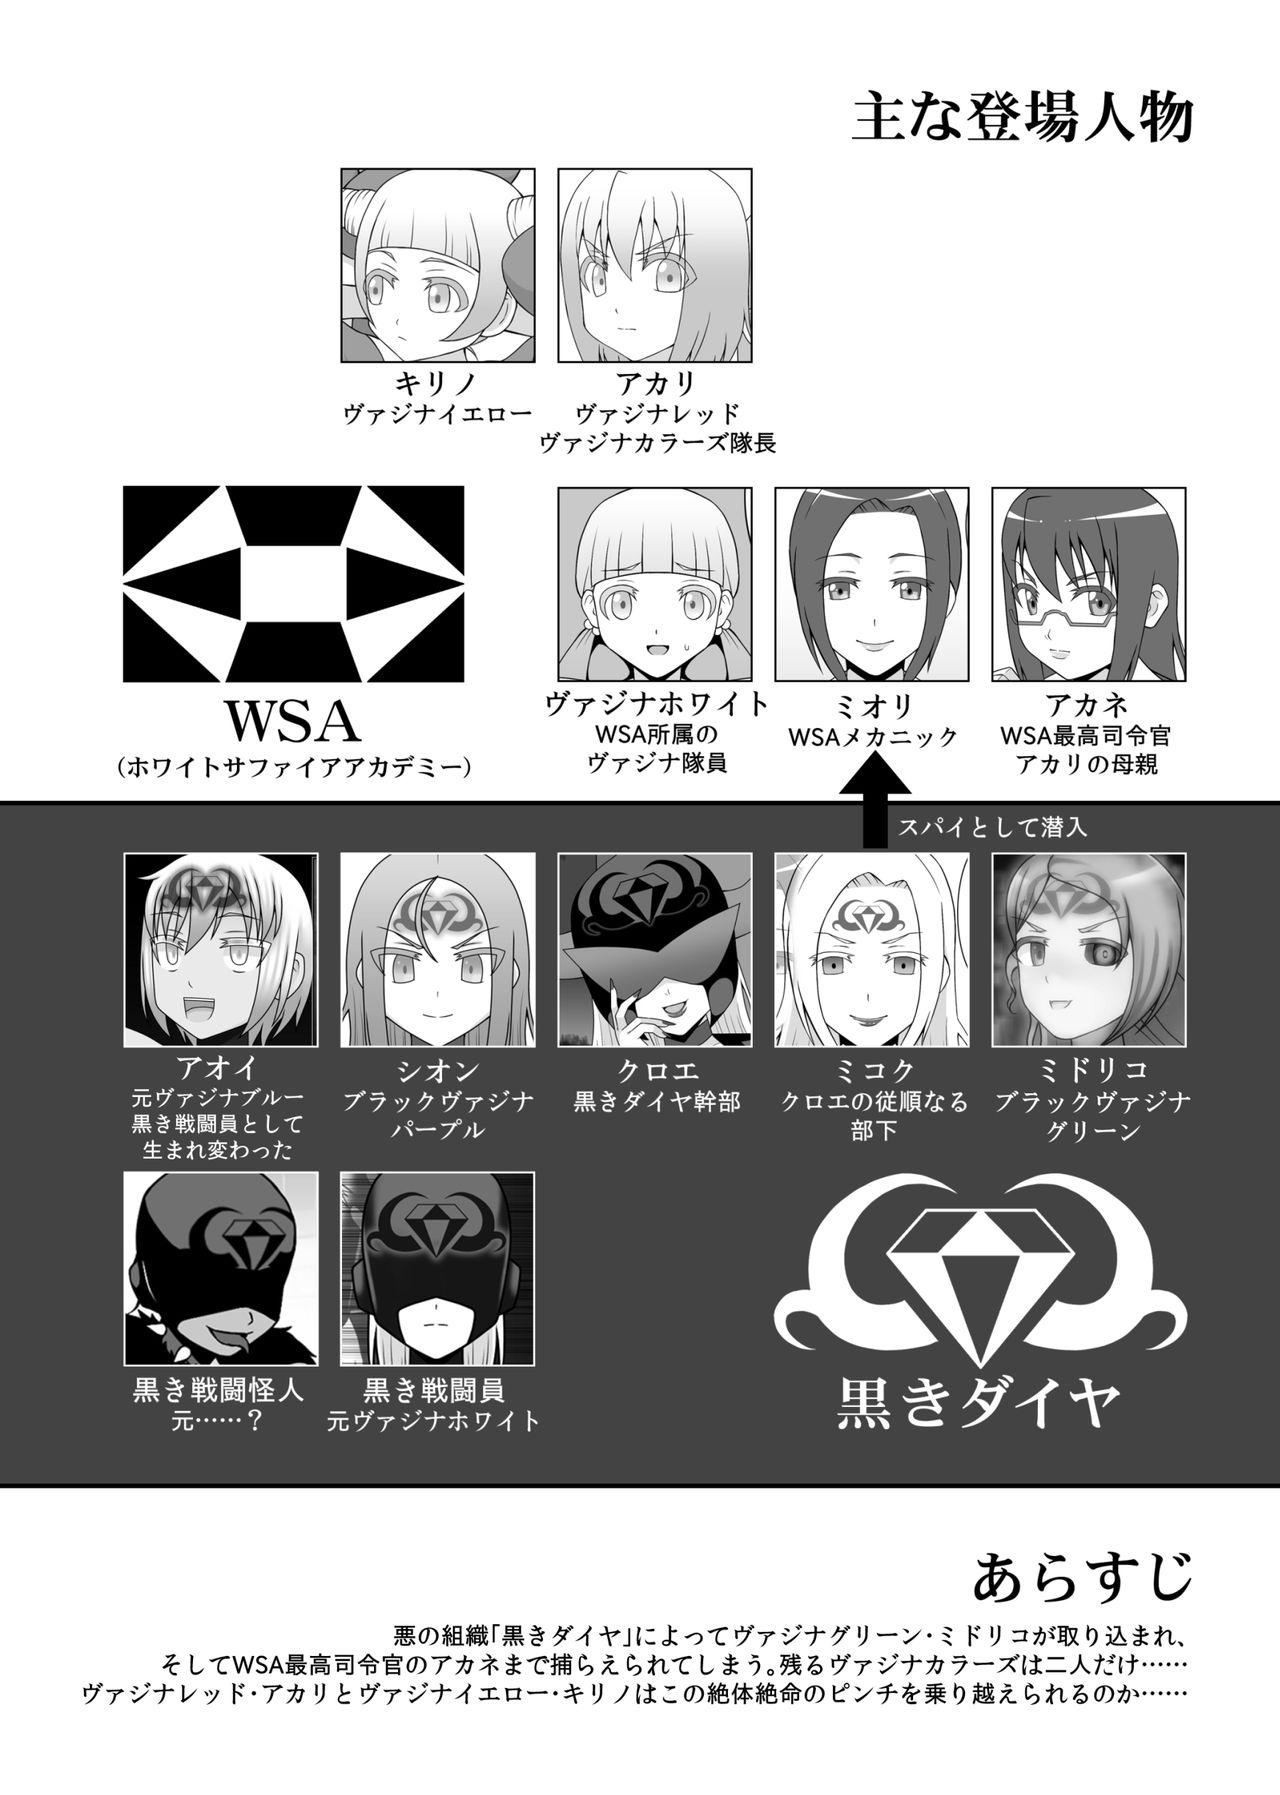 [STUDIO HP+ (IceLee)] Teisou Sentai Virginal Colors Dai-Go-wa 0